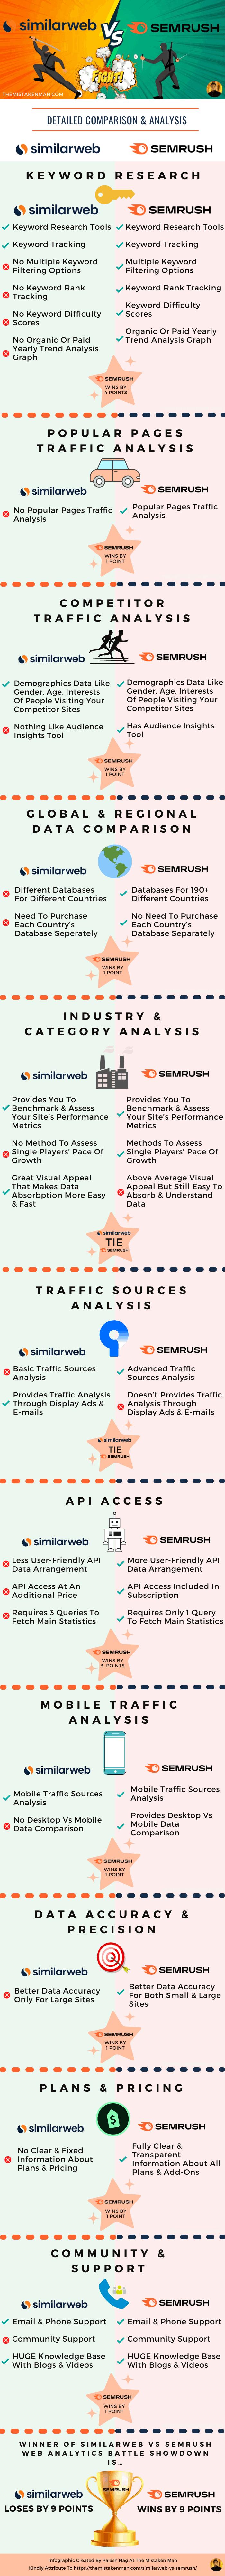 similarweb-vs-semrush-infographic-by-palash-nag-themistakenman_1